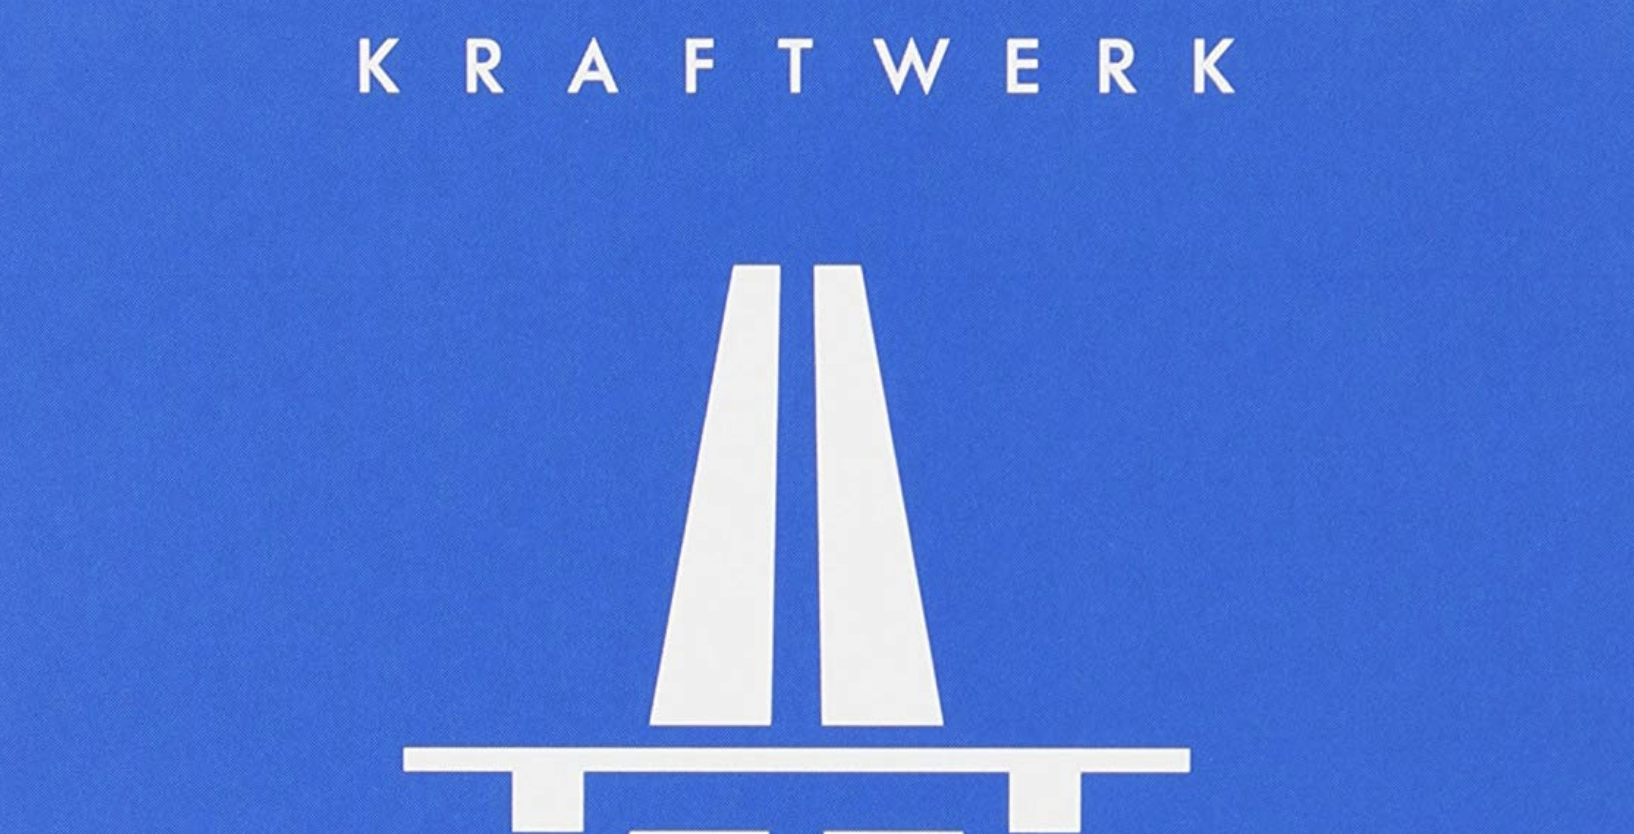 The Mysterious Origin Story Of Kraftwerk's Now-Iconic Autobahn Motorway Icon